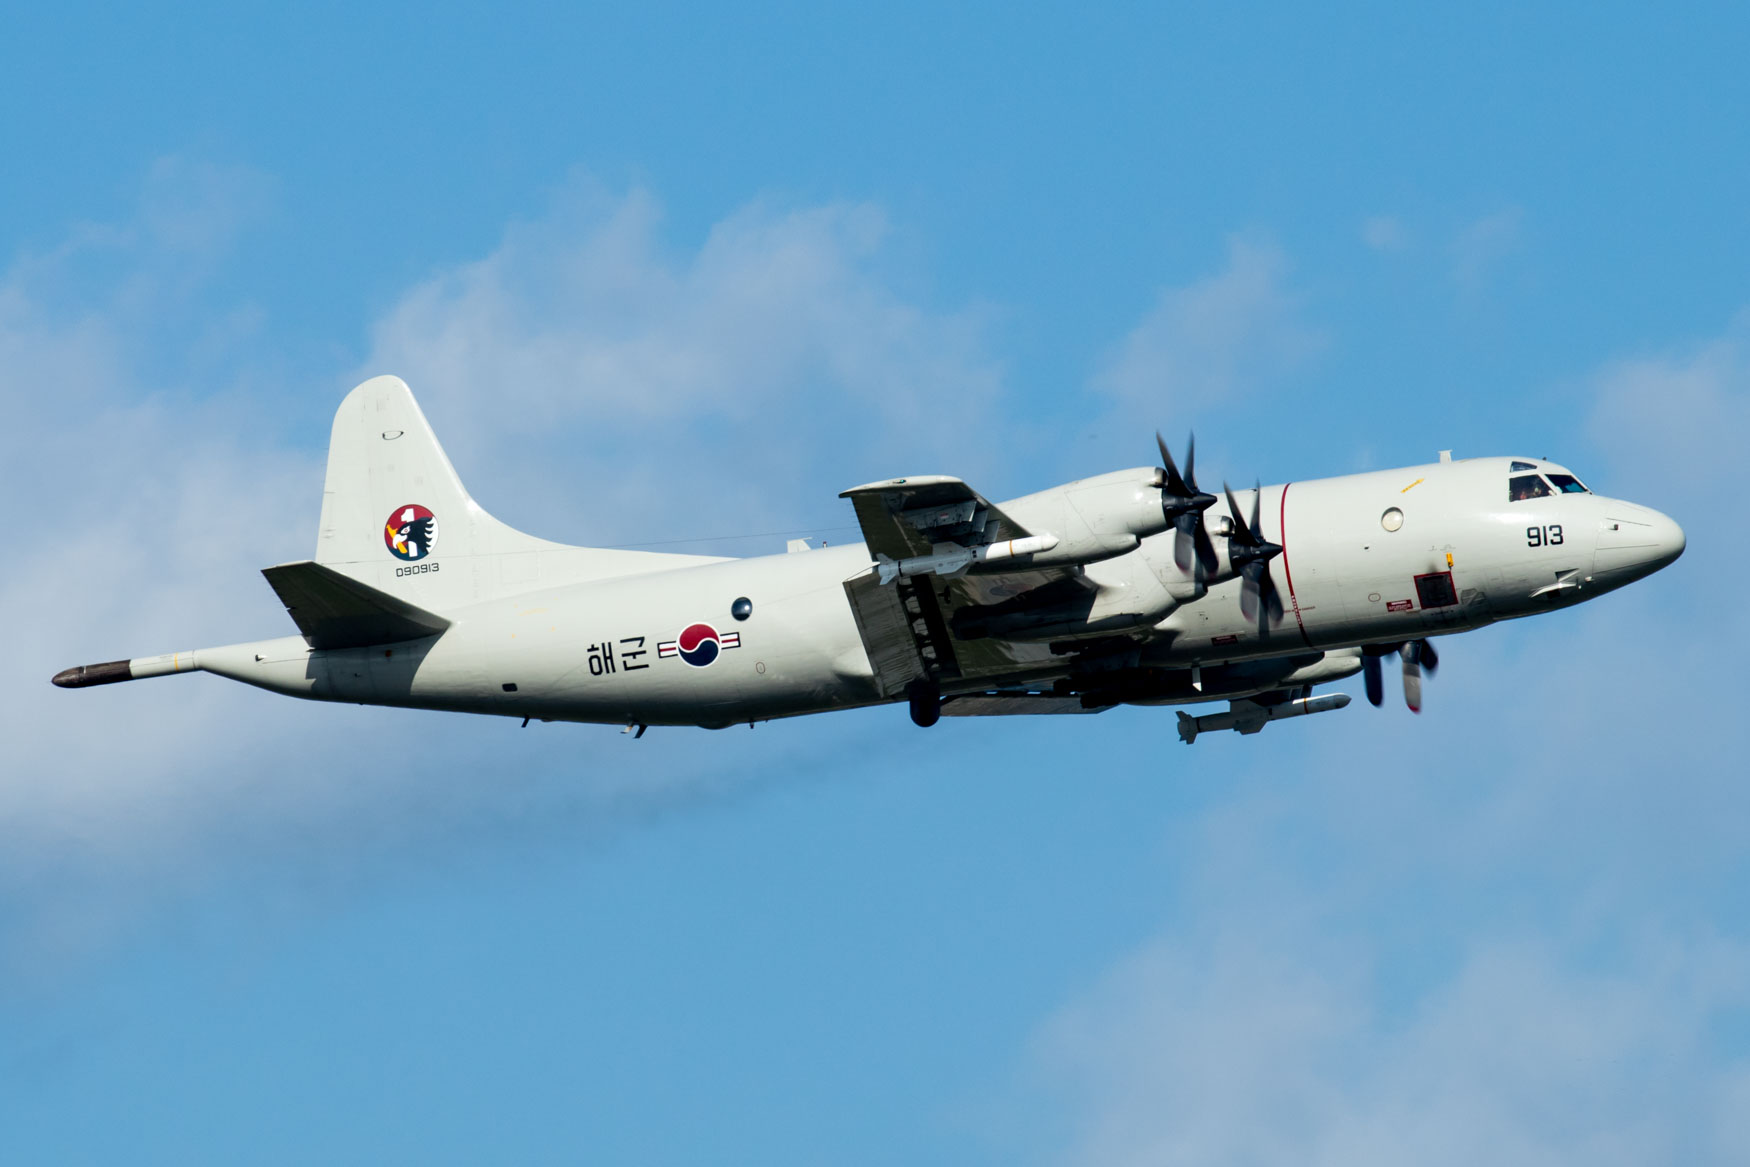 Republic of Korea Navy P-3